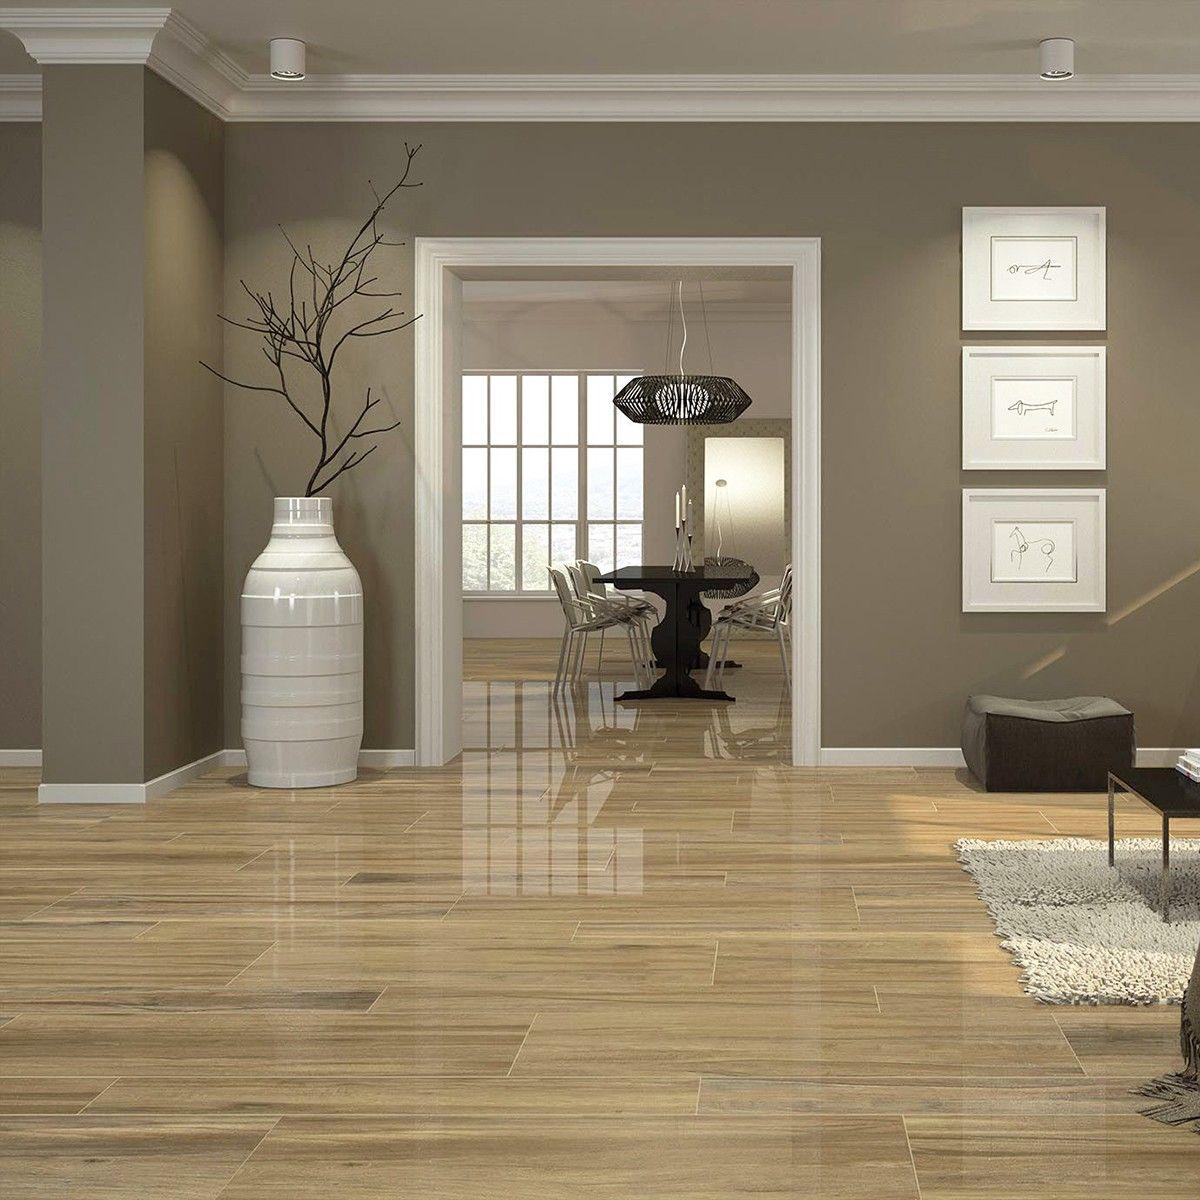 Crown Tiles 120x20 Hilton Pine Wood Effect Tiles Living Room Tiles Paint Colors For Living Room Brown Living Room Paint